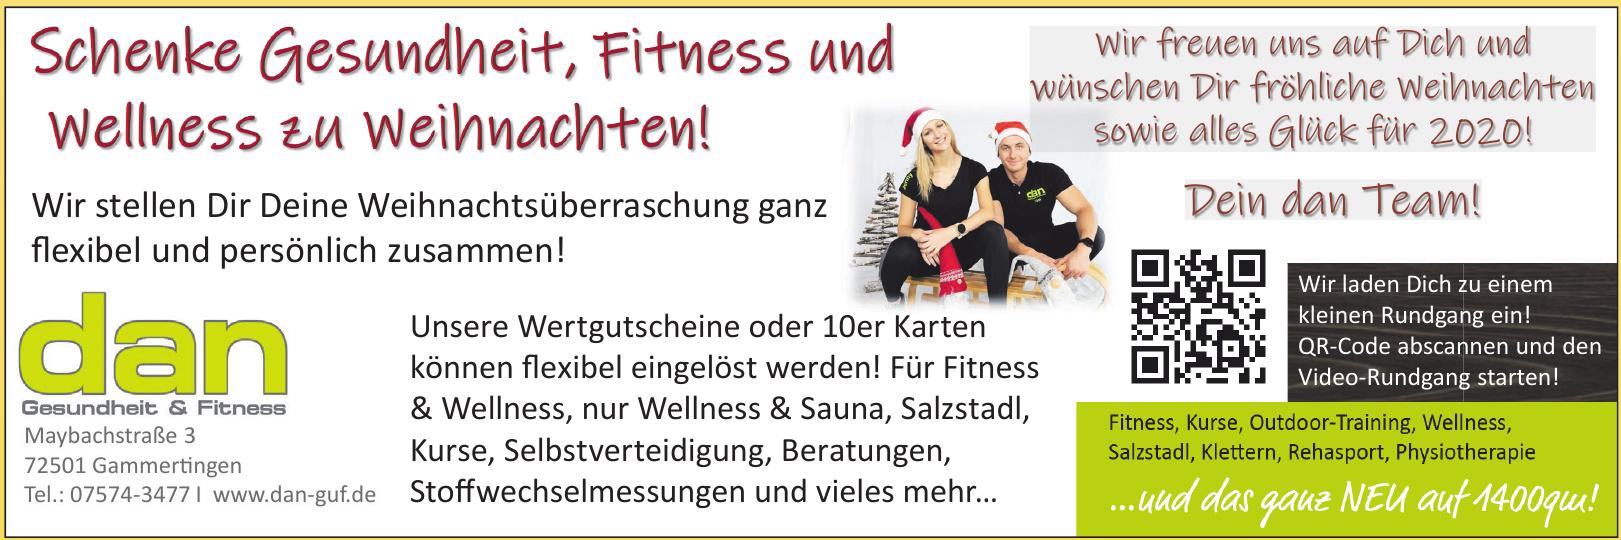 dan Gesundheit & Fitness UG